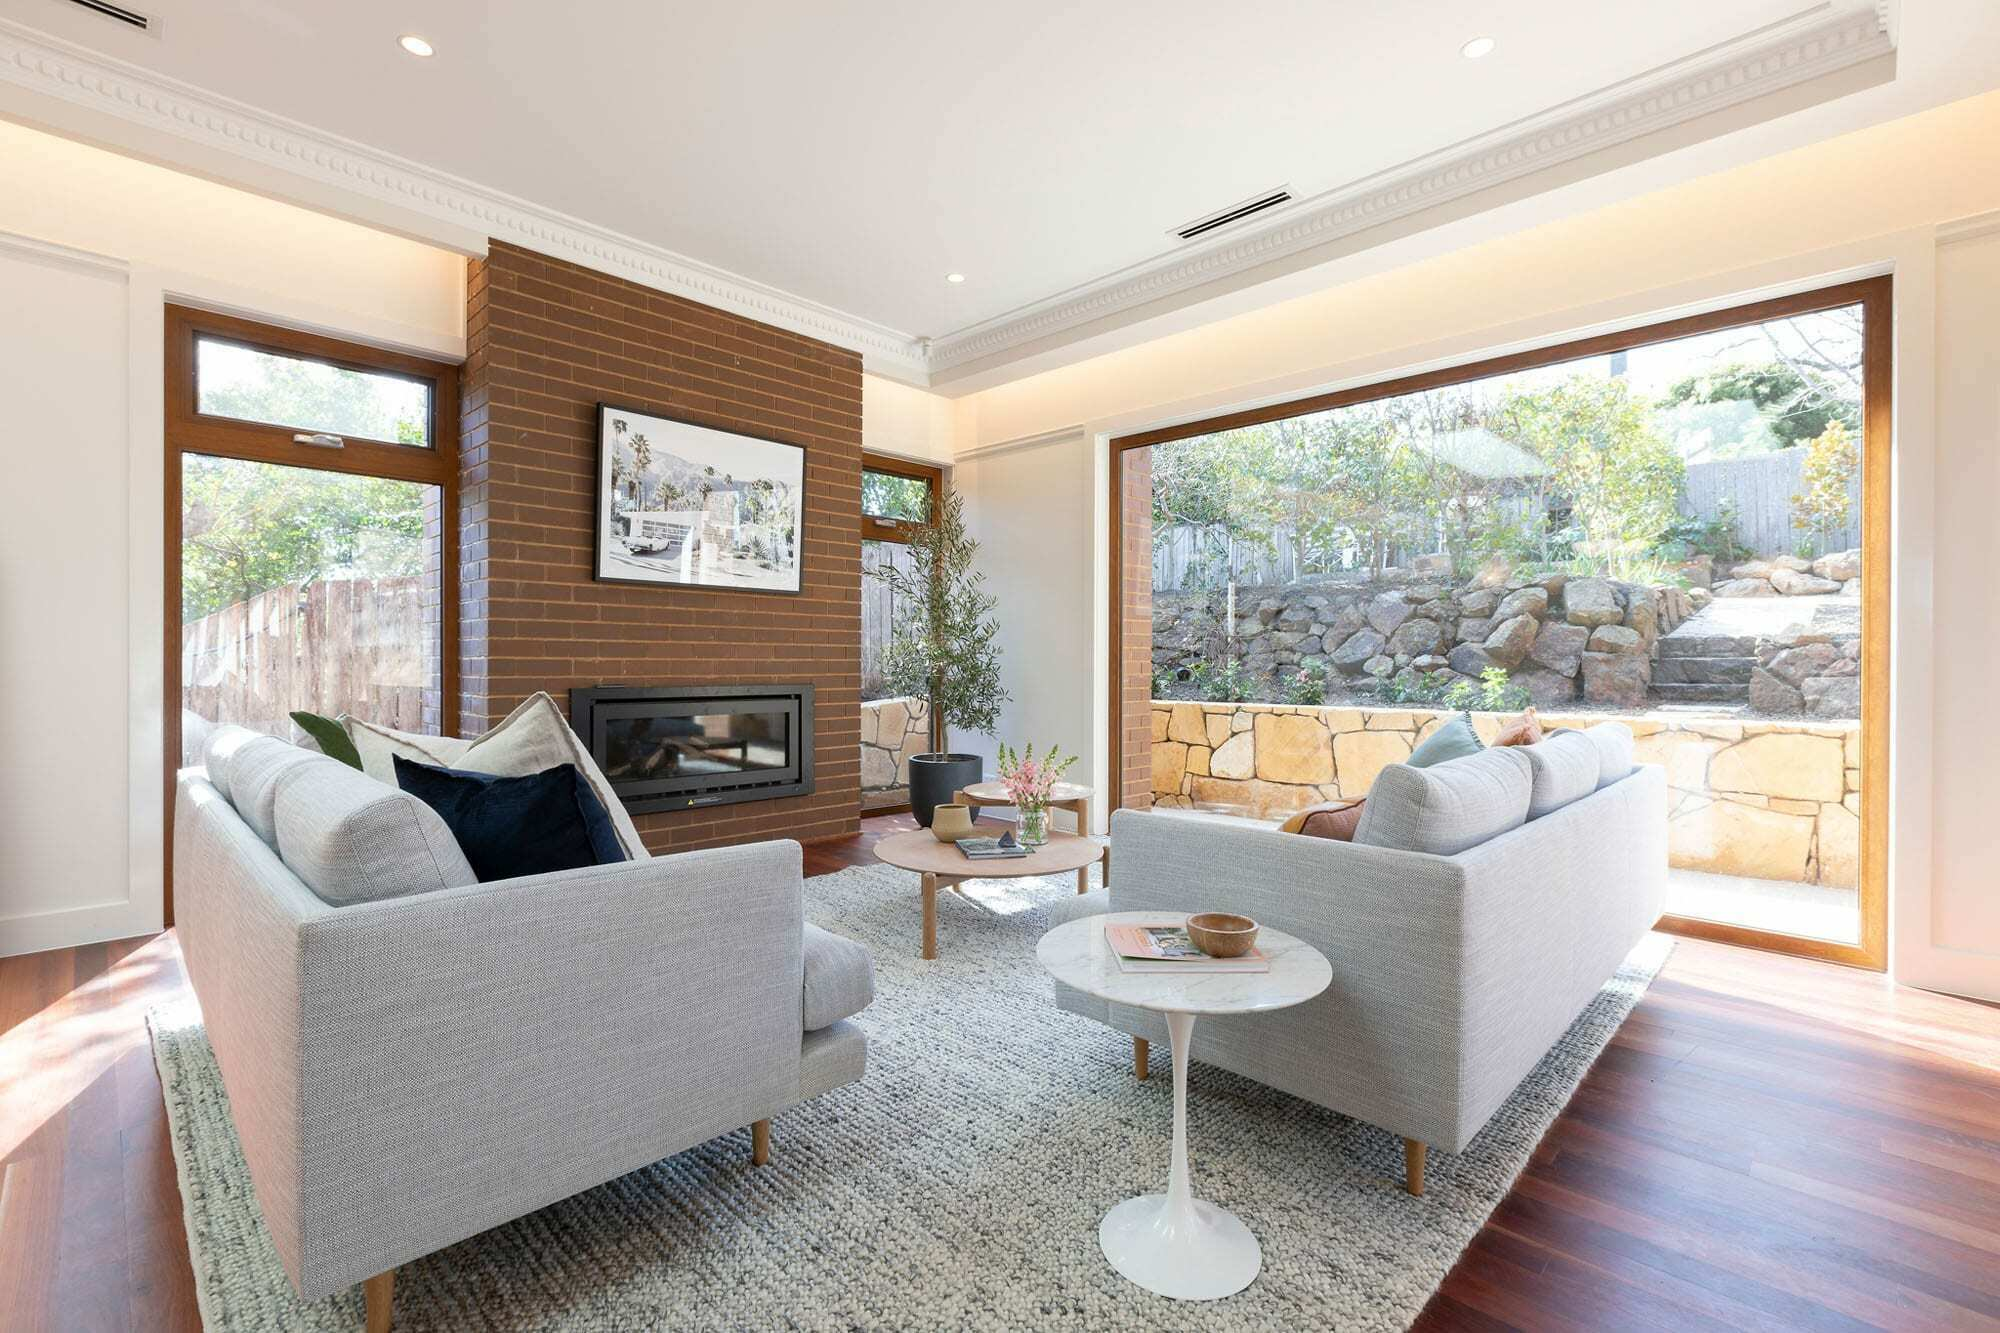 Homes by Howe Canberra builder – Governor Generals' renovation extension – lounge room